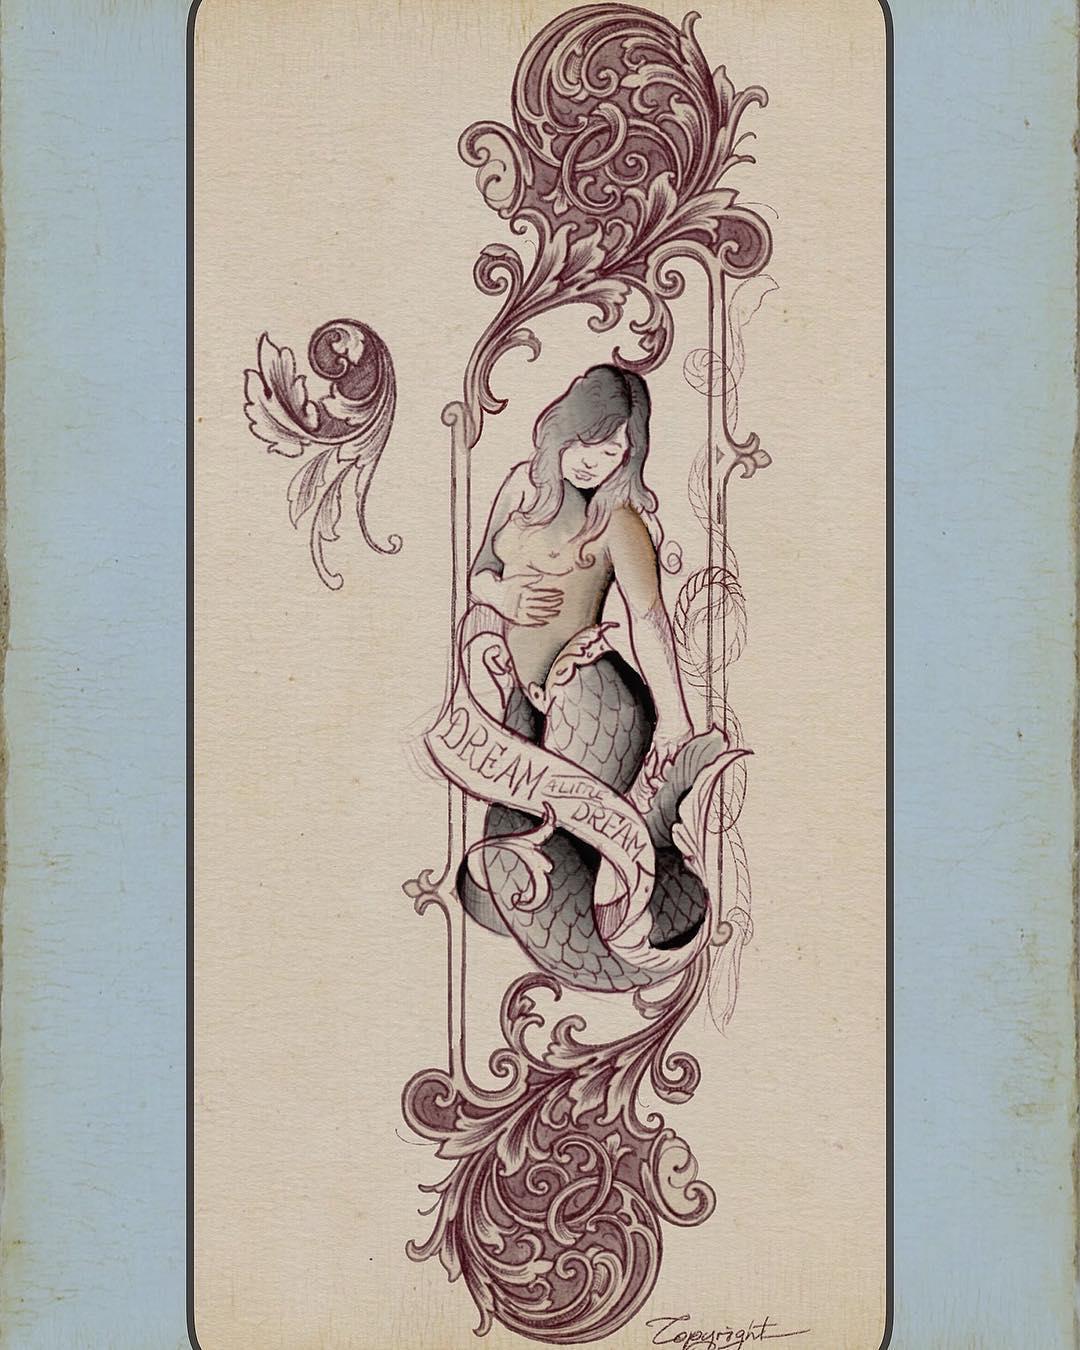 #sideshowtraveling #scrollwork #mermaid #digitalink #traditionaltattooflash #tra